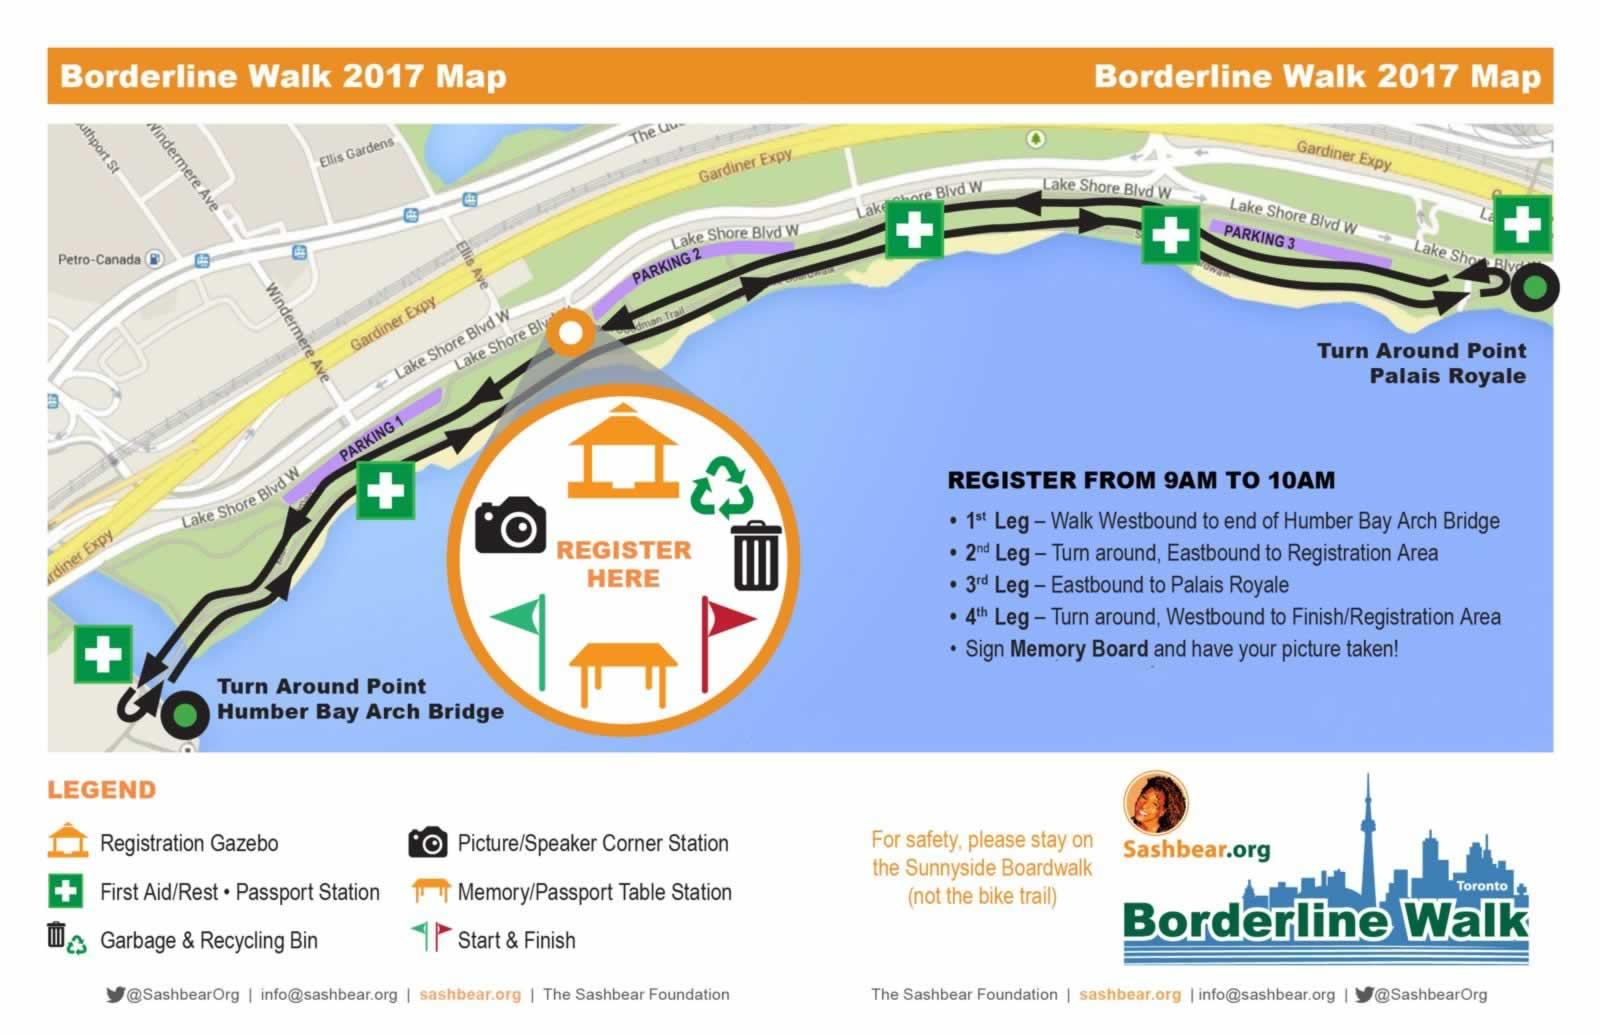 borderline-walk-map.jpg